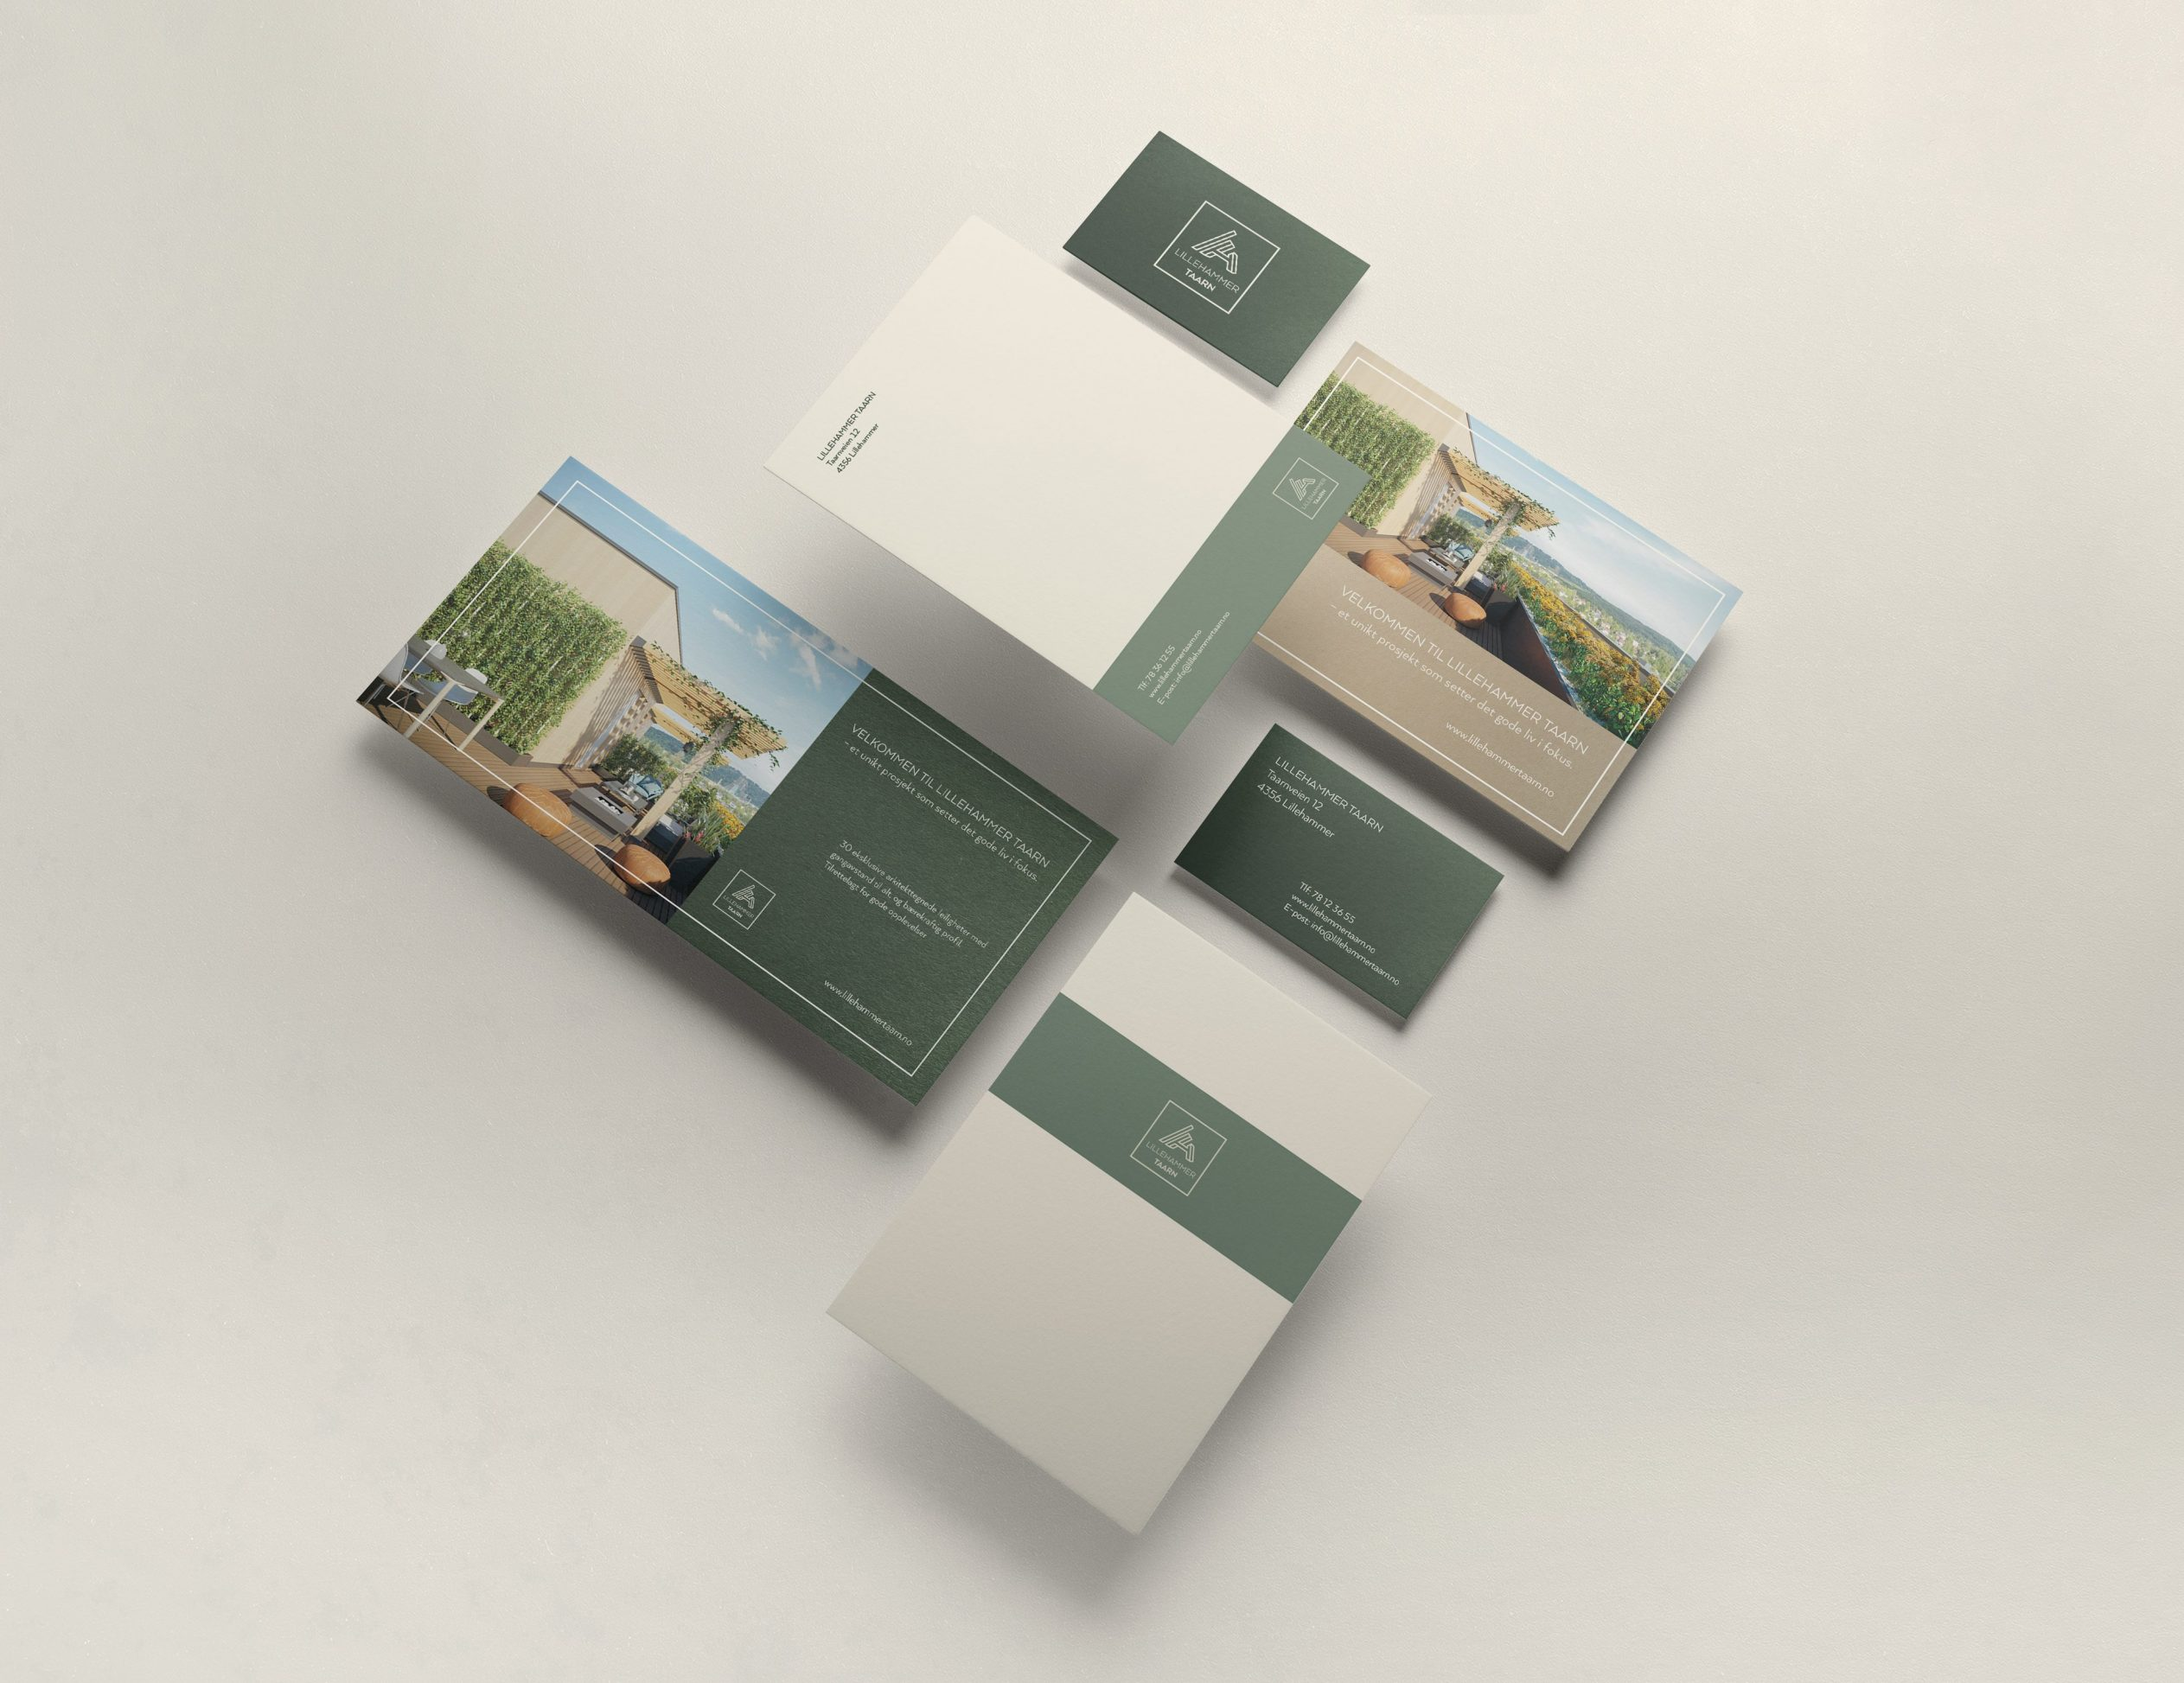 Lillehammer Taarn visuell identitet prospekt eiendom boligprosjekt logo prospekt